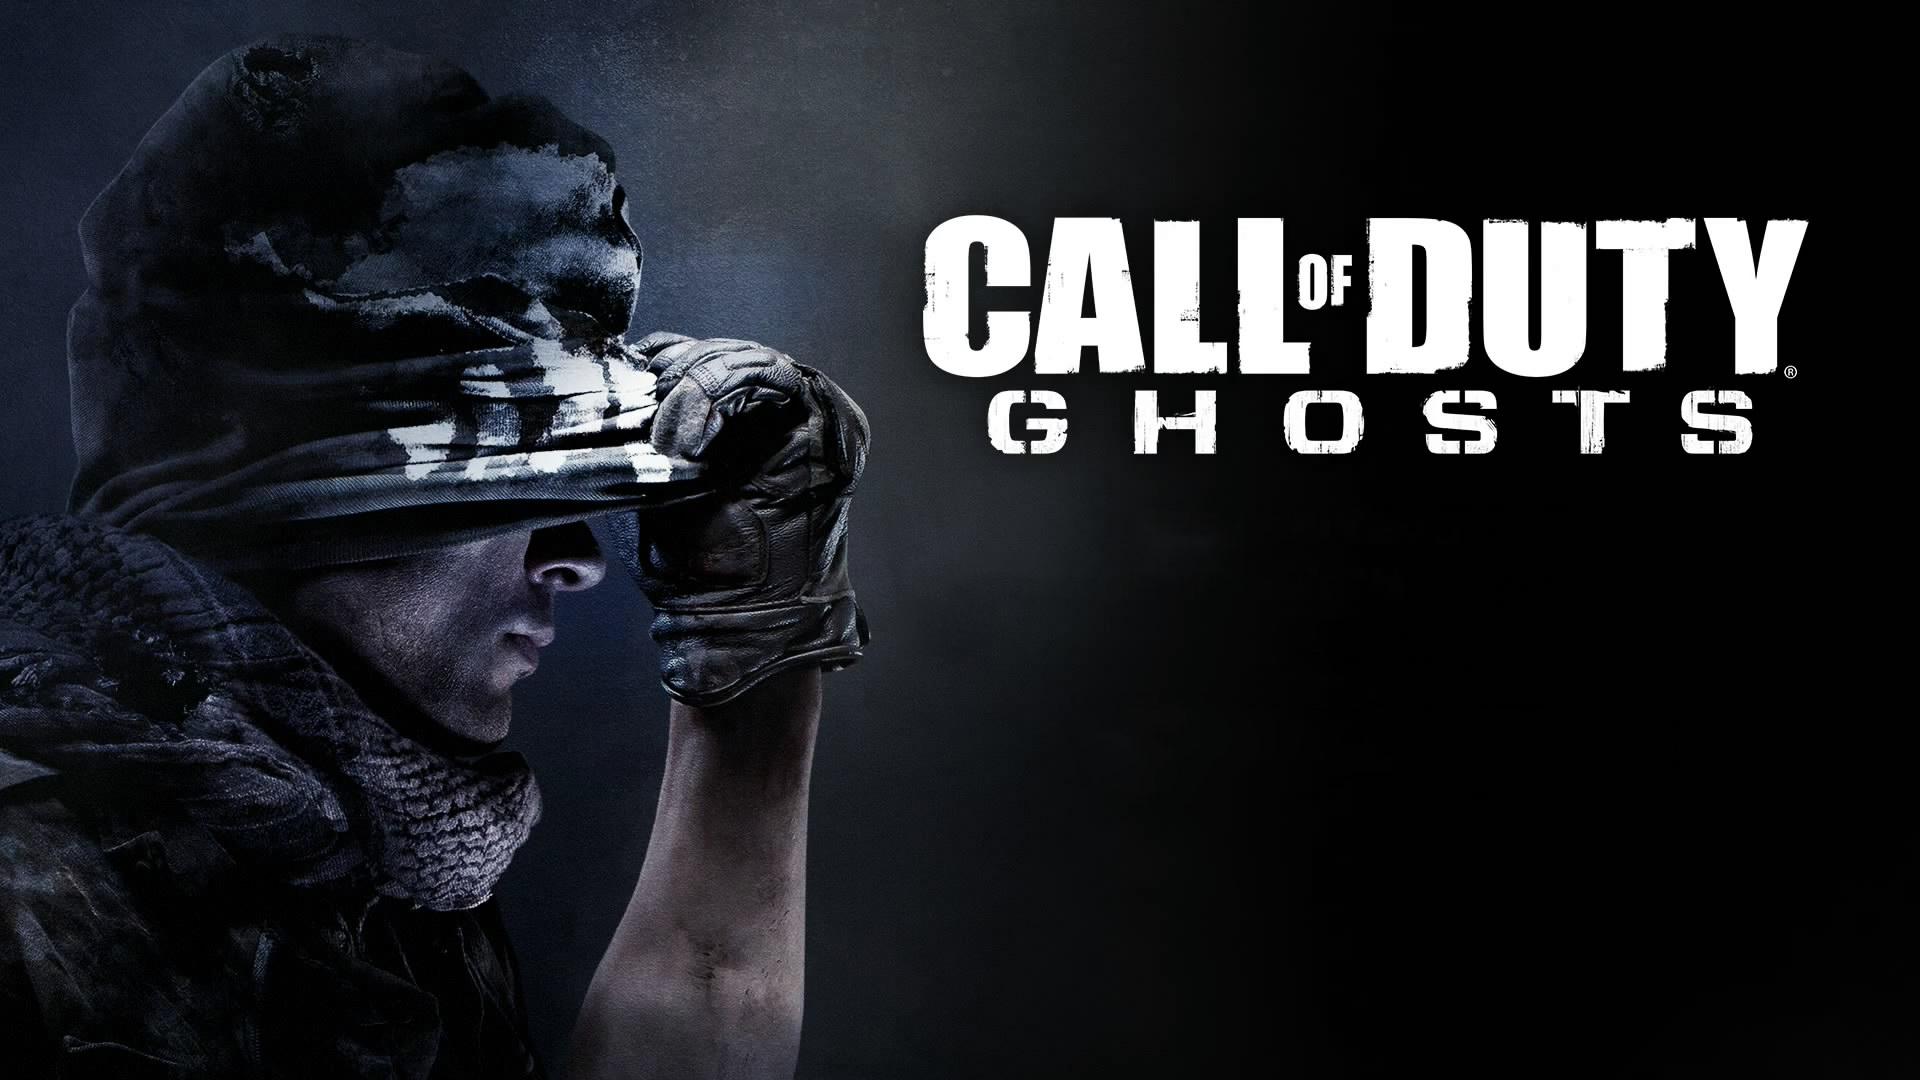 call_of_duty_ghosts.jpg